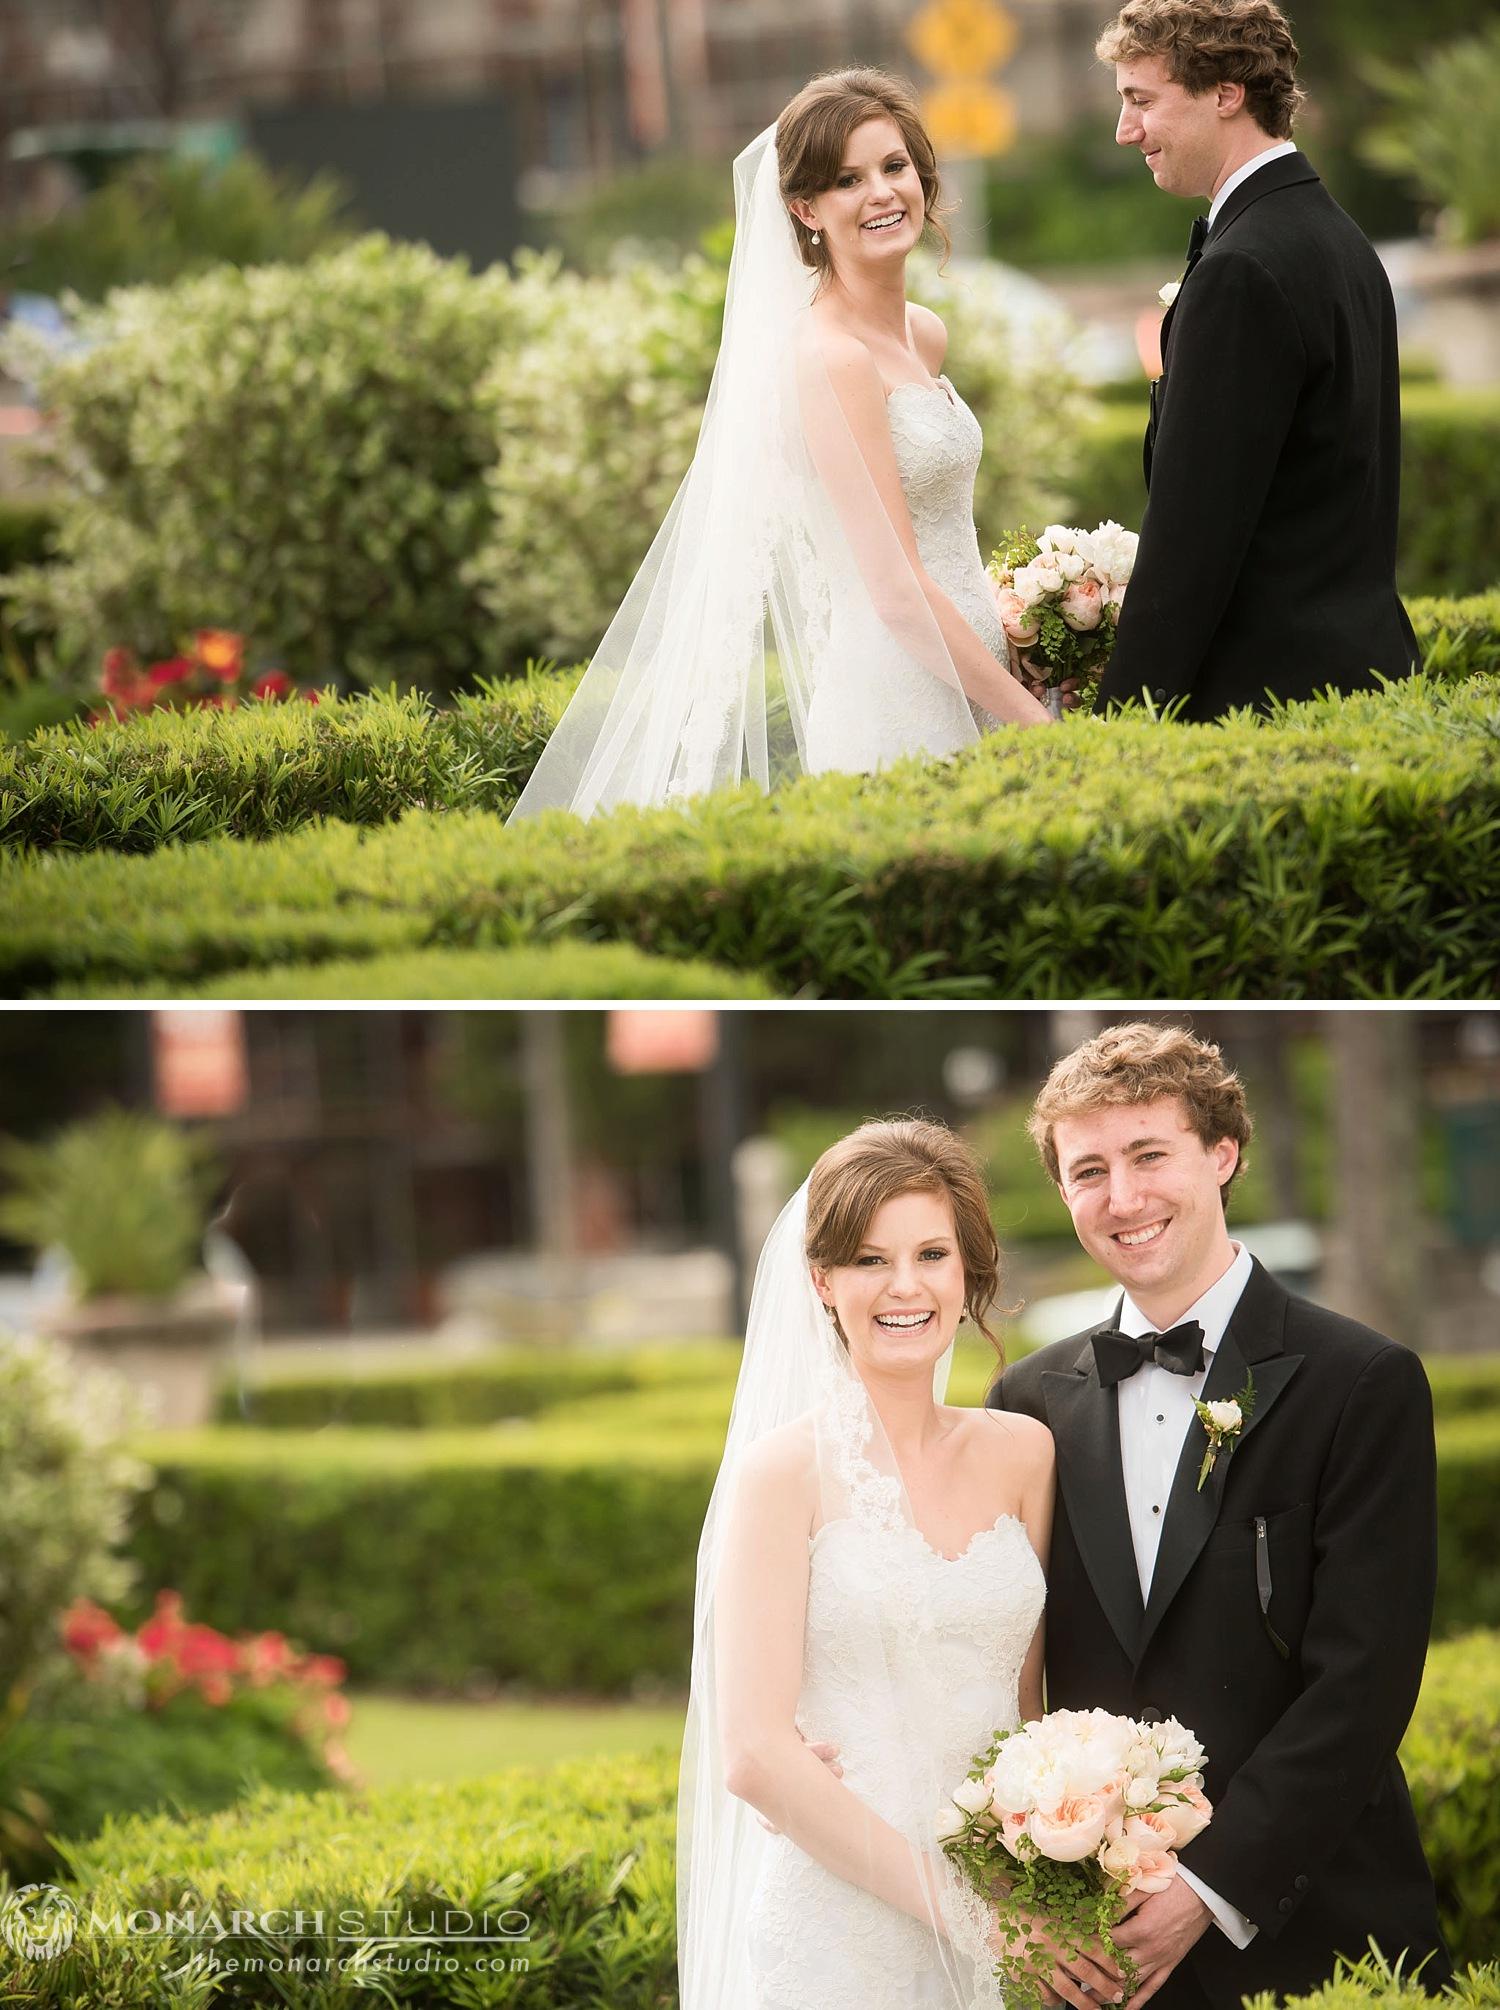 St-Augustine-Wedding-Photographer-Zach-Thomas-Riverhouse-Monarch-029.JPG